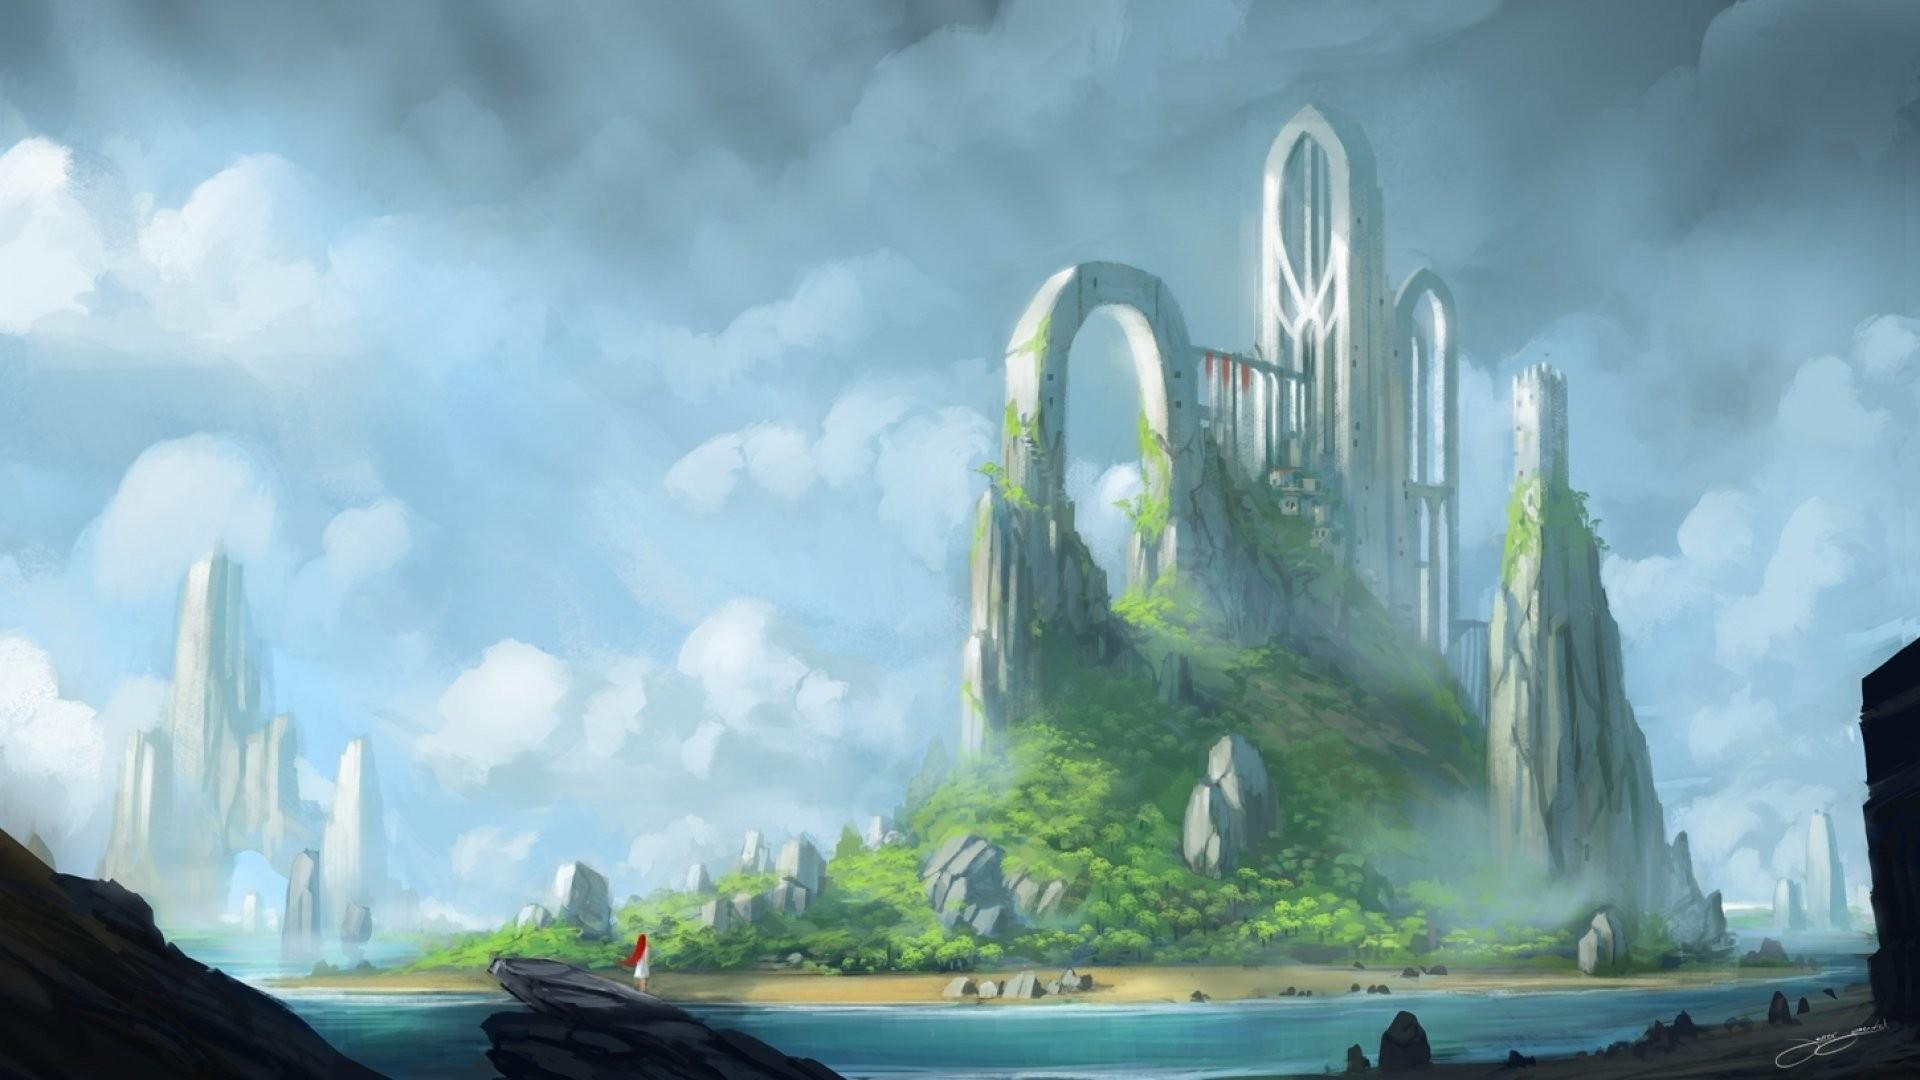 fantasy landscape wallpaper 1920x1080 183�� download free